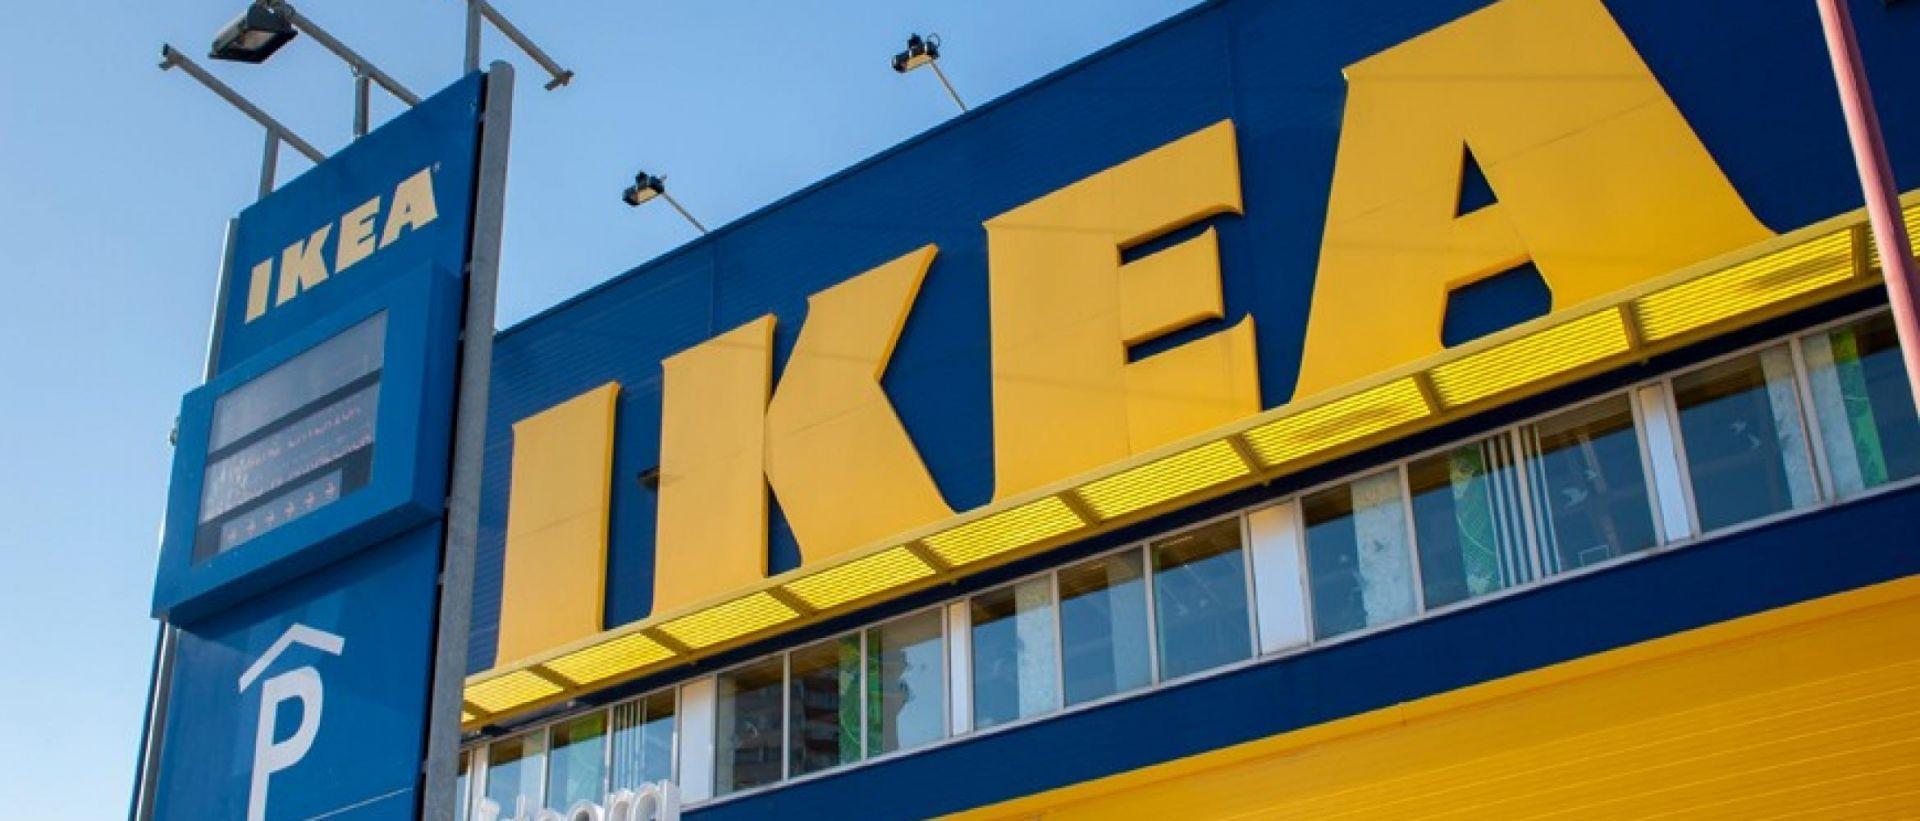 IKEA llegar a docena de pases varios latinoamericanos